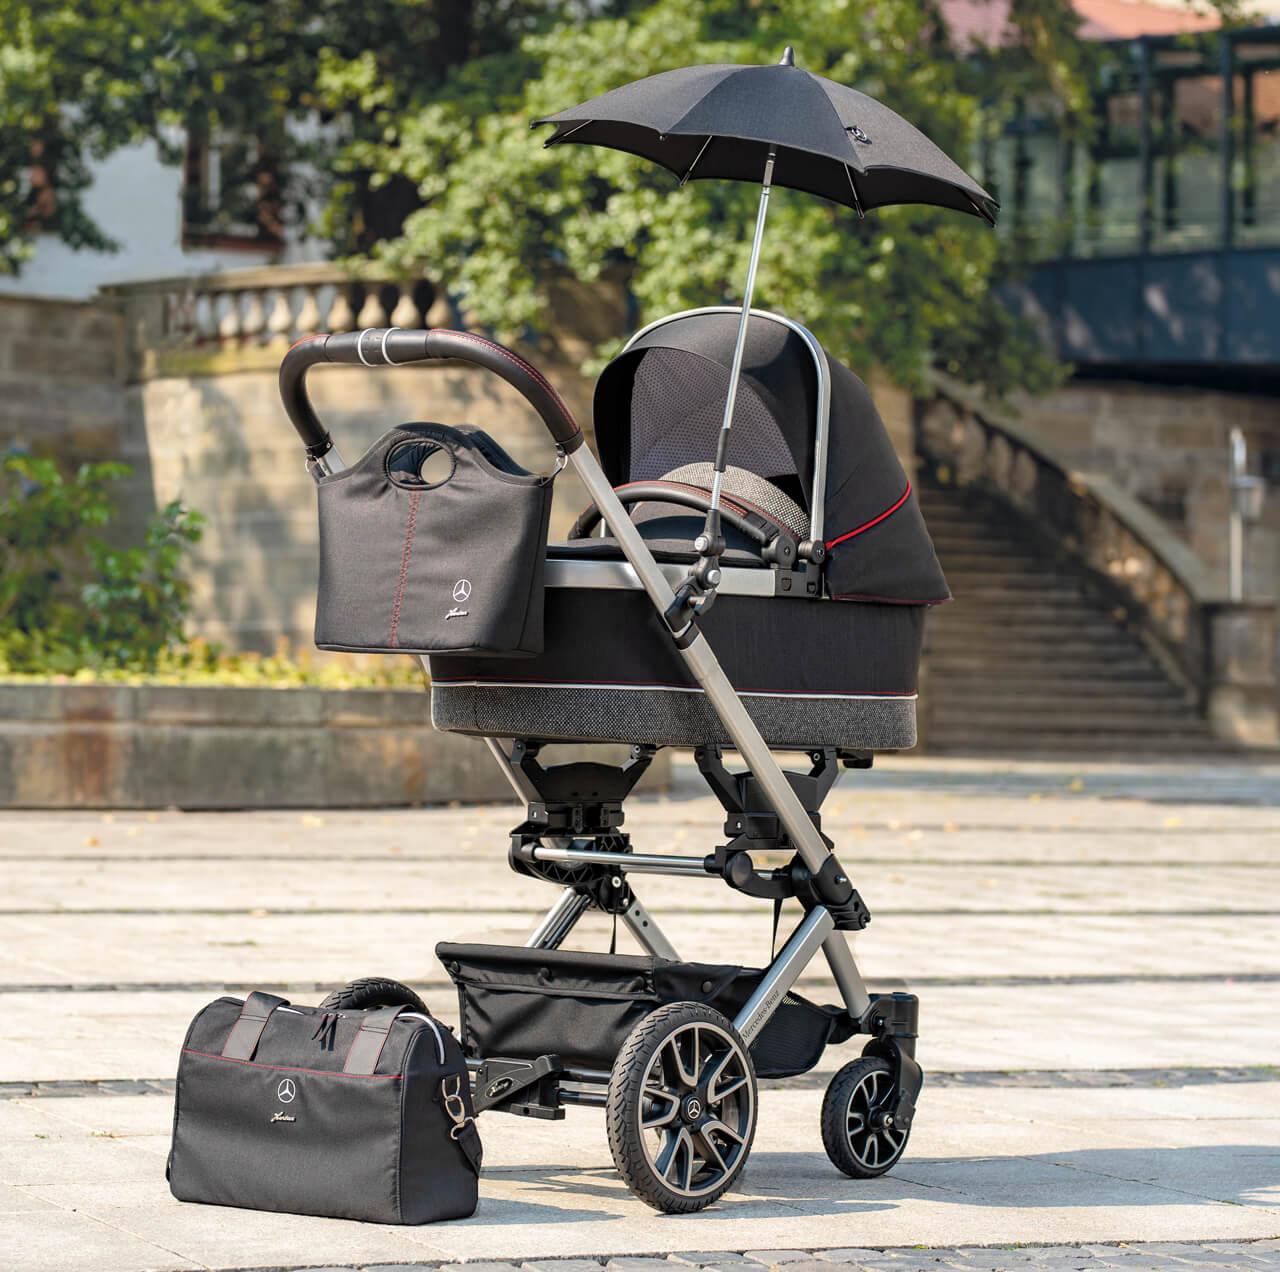 Mercedes-Benz-baby-carriage-Avantgarde_04.jpg